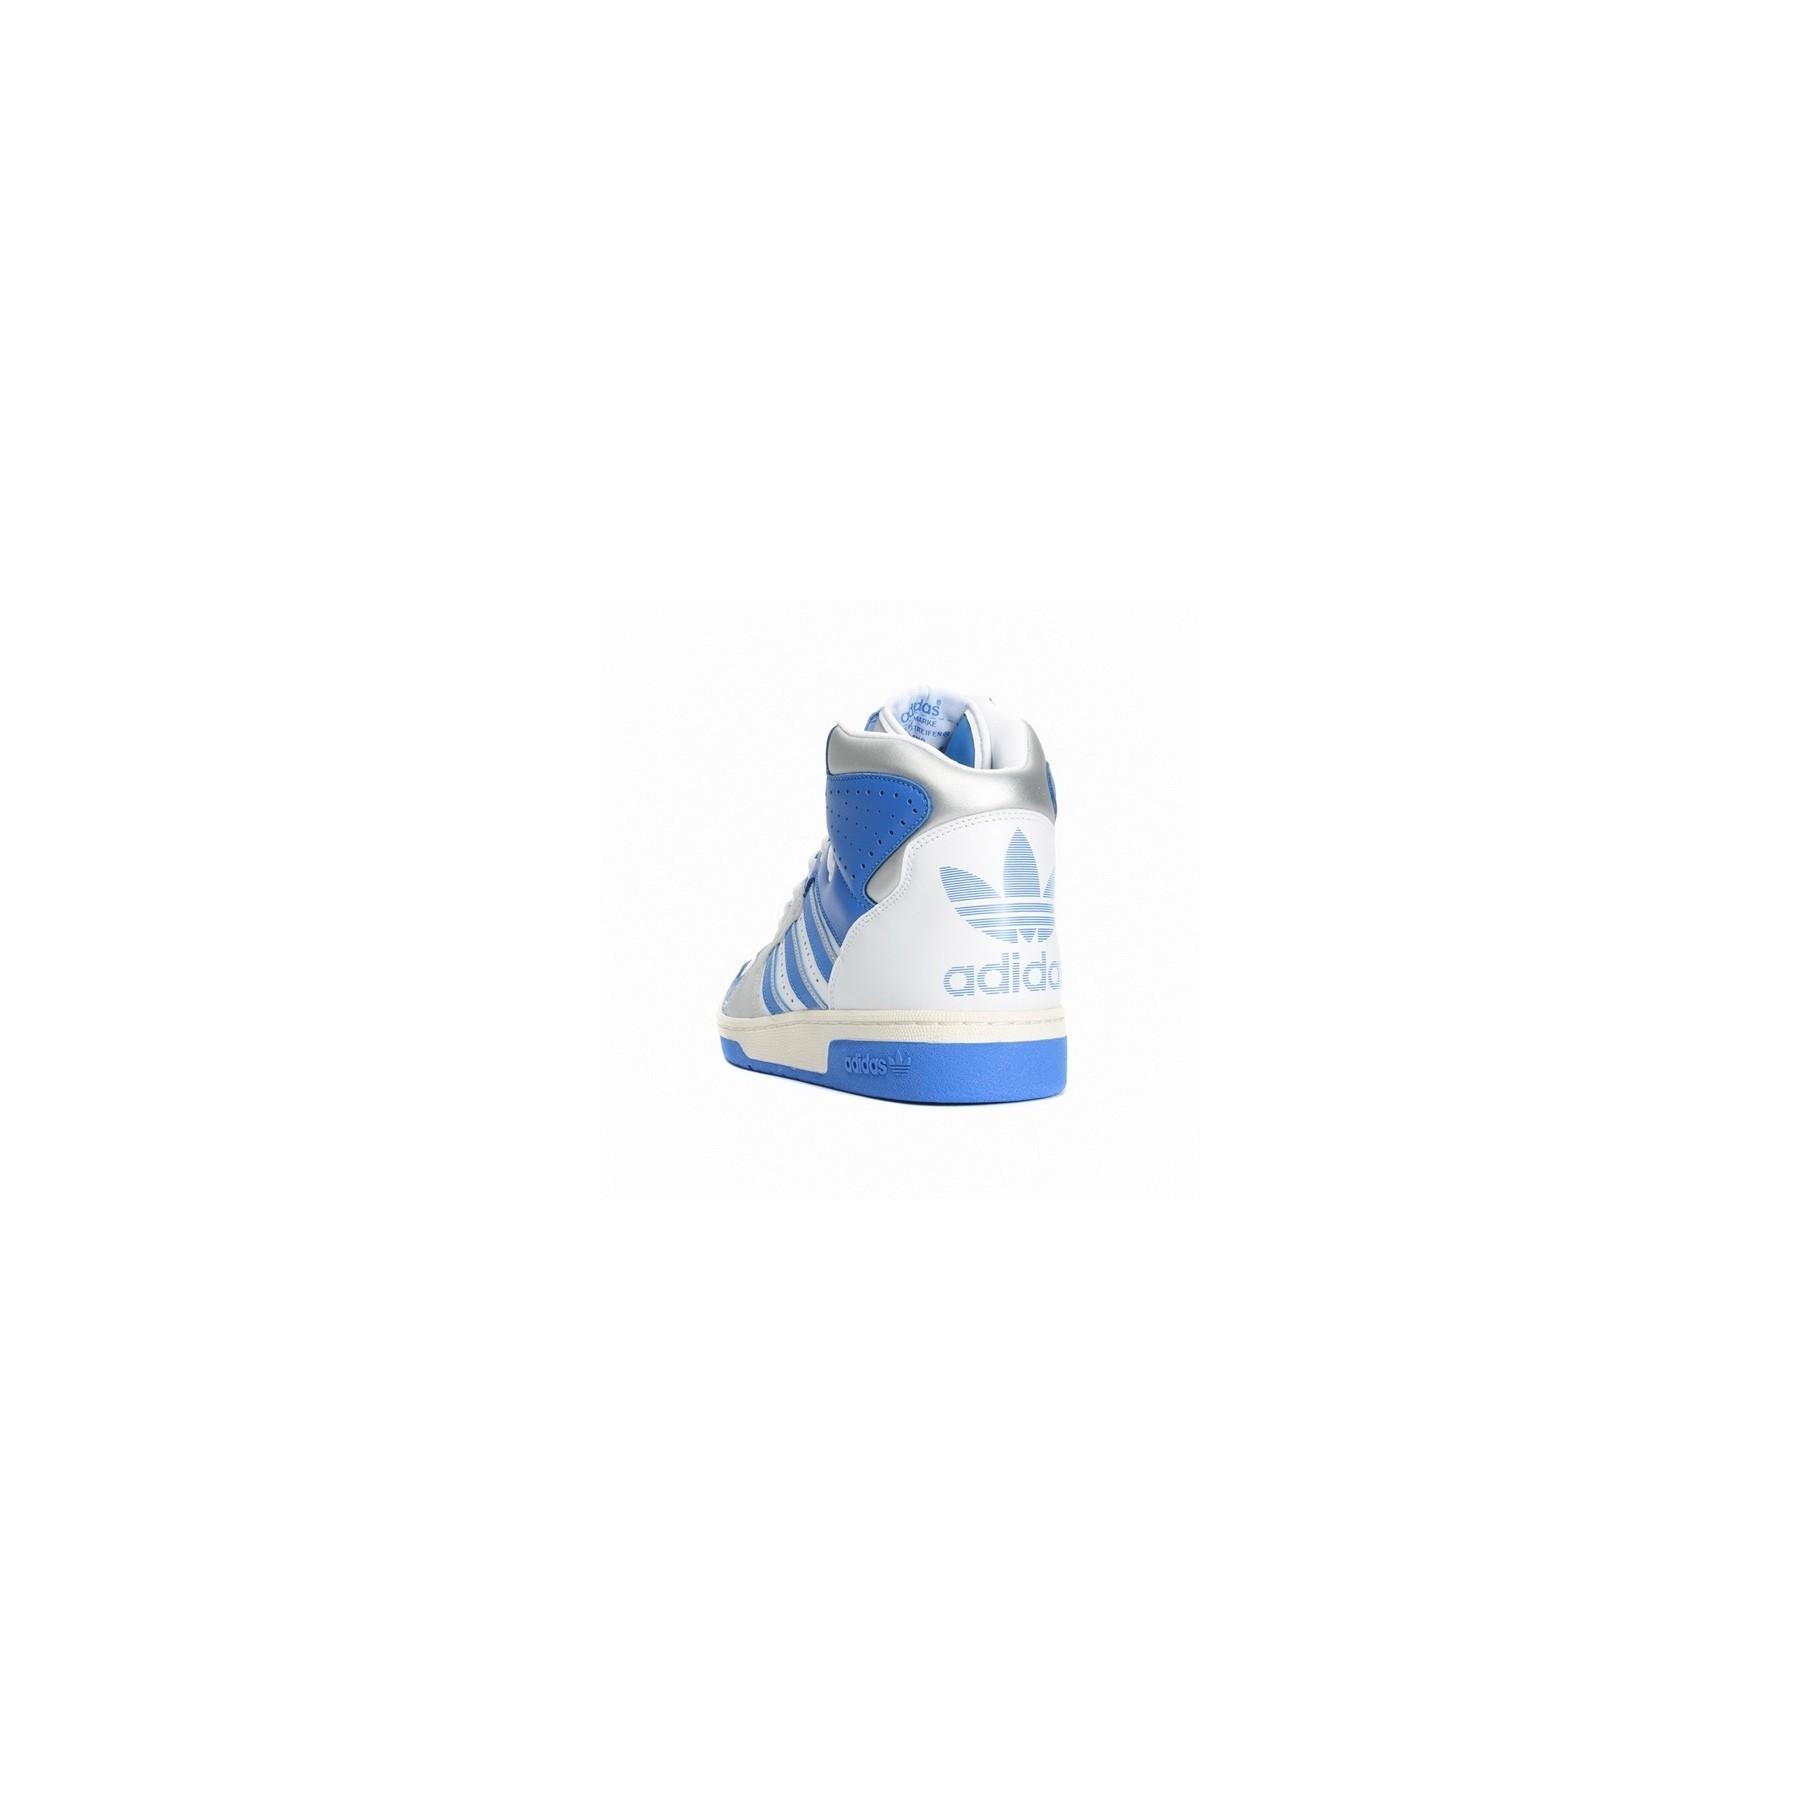 c0bb43237 scarpa-alta-adidas-shoes-instinct-og-bluebird-bluebird-white-unico.jpg